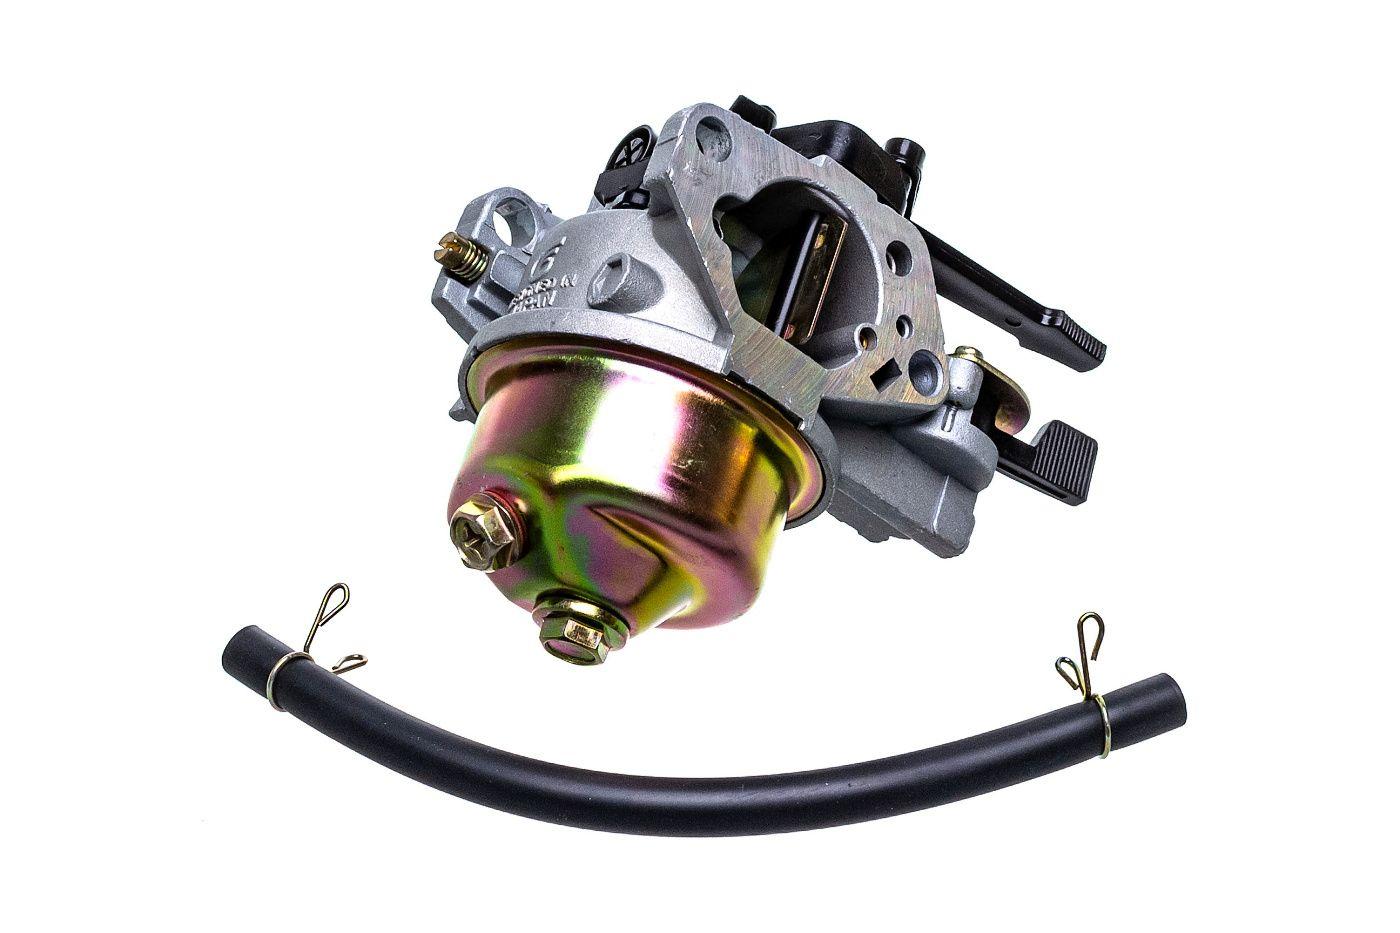 Karburátor HONDA GX240, GX270, 16100-ZE2-W71, 1616100-ZH9-820 SUPER AKCE